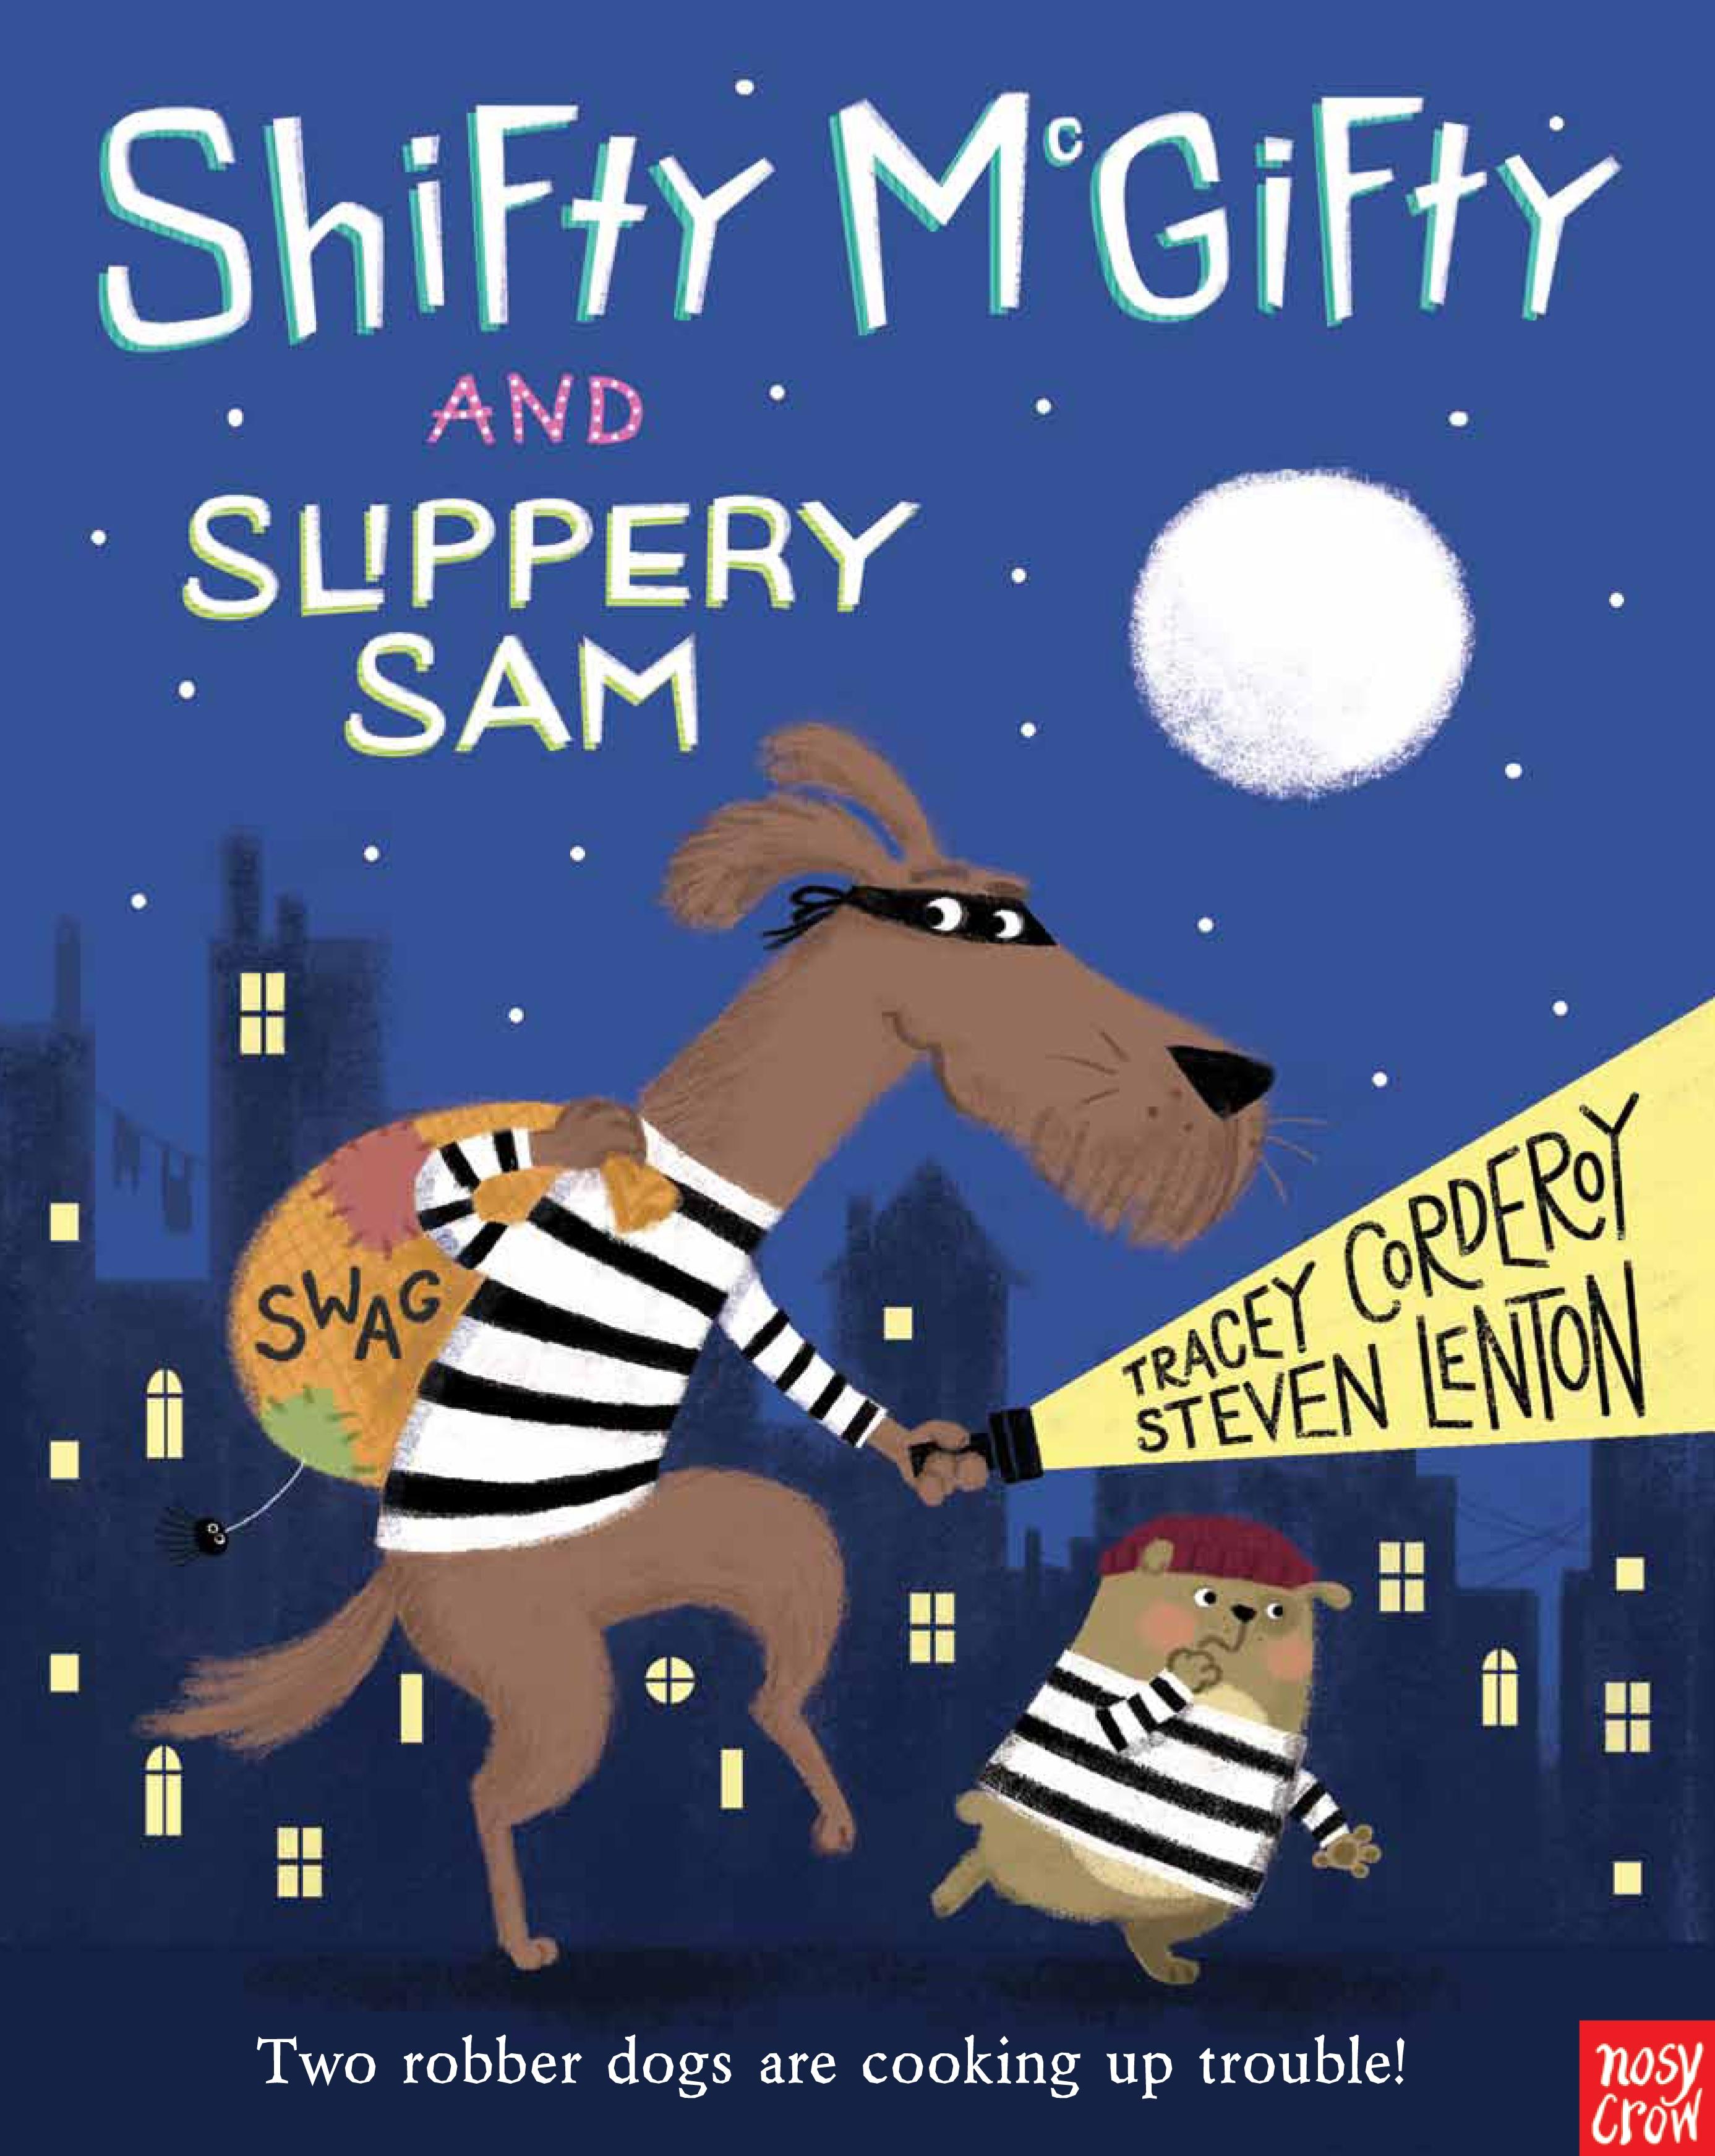 Shifty McGifty and Slippery Sam cushman proving